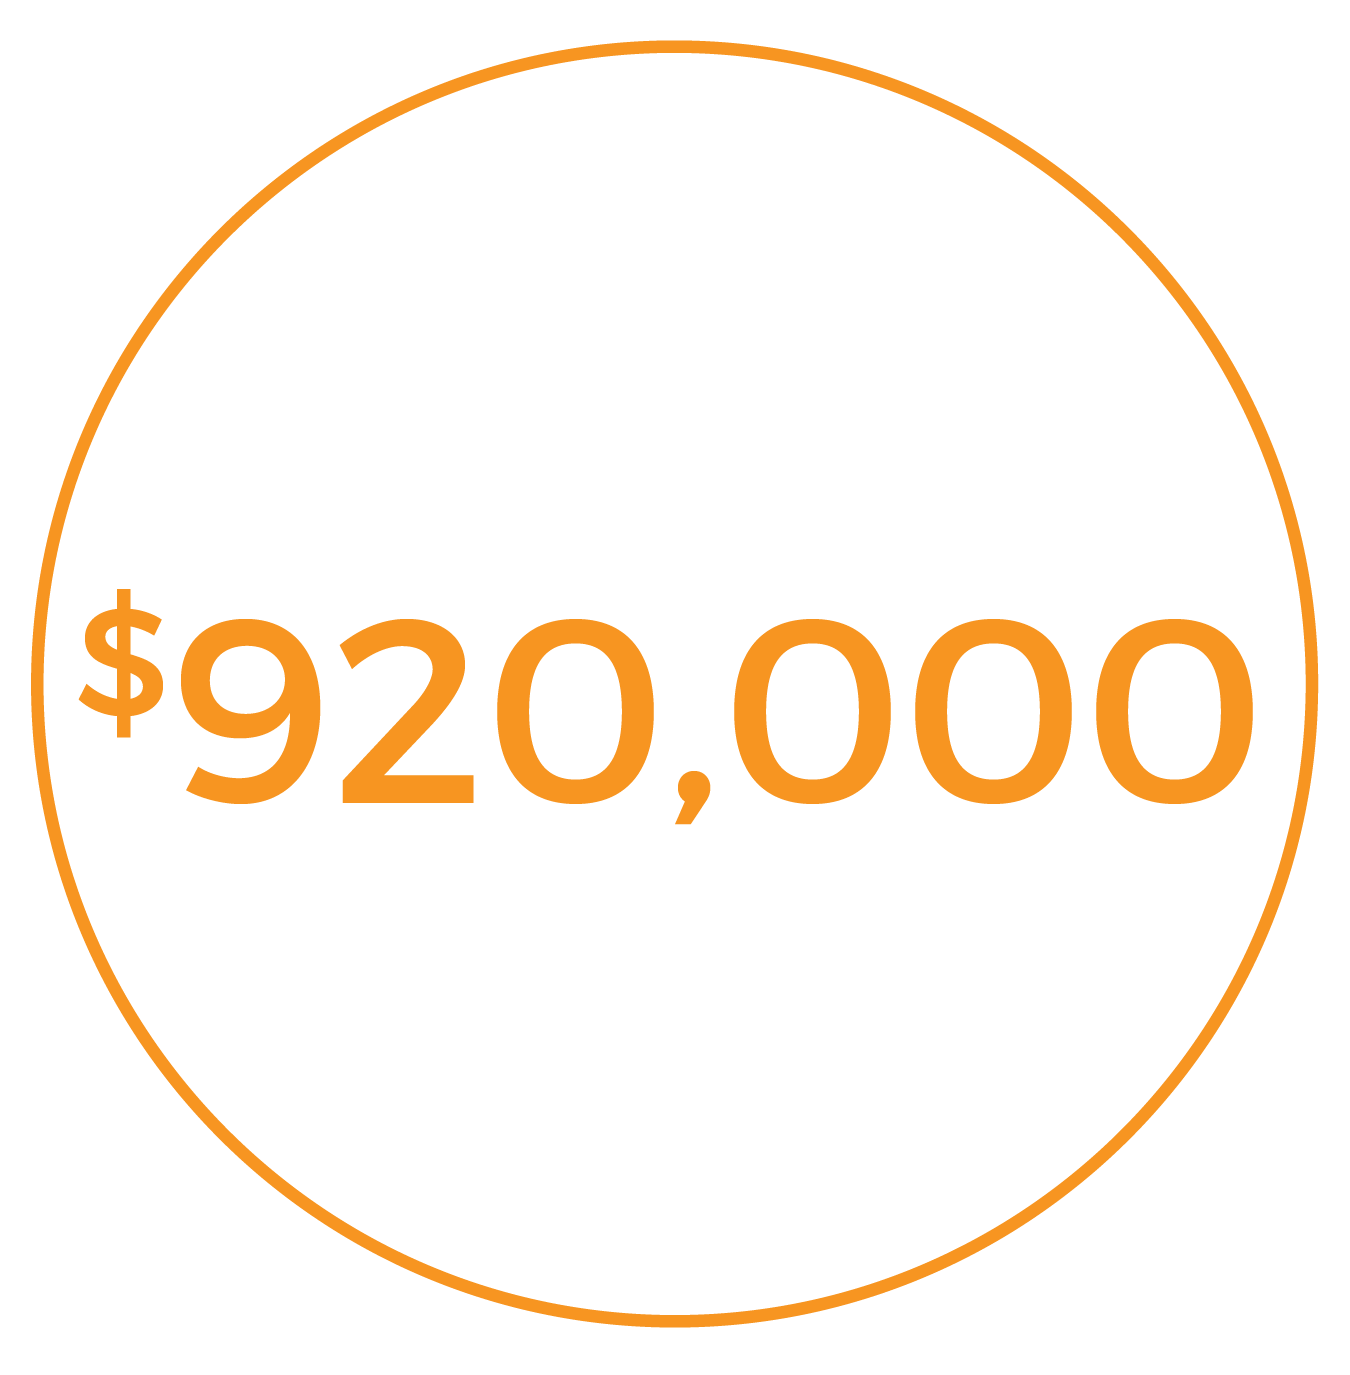 $920,000